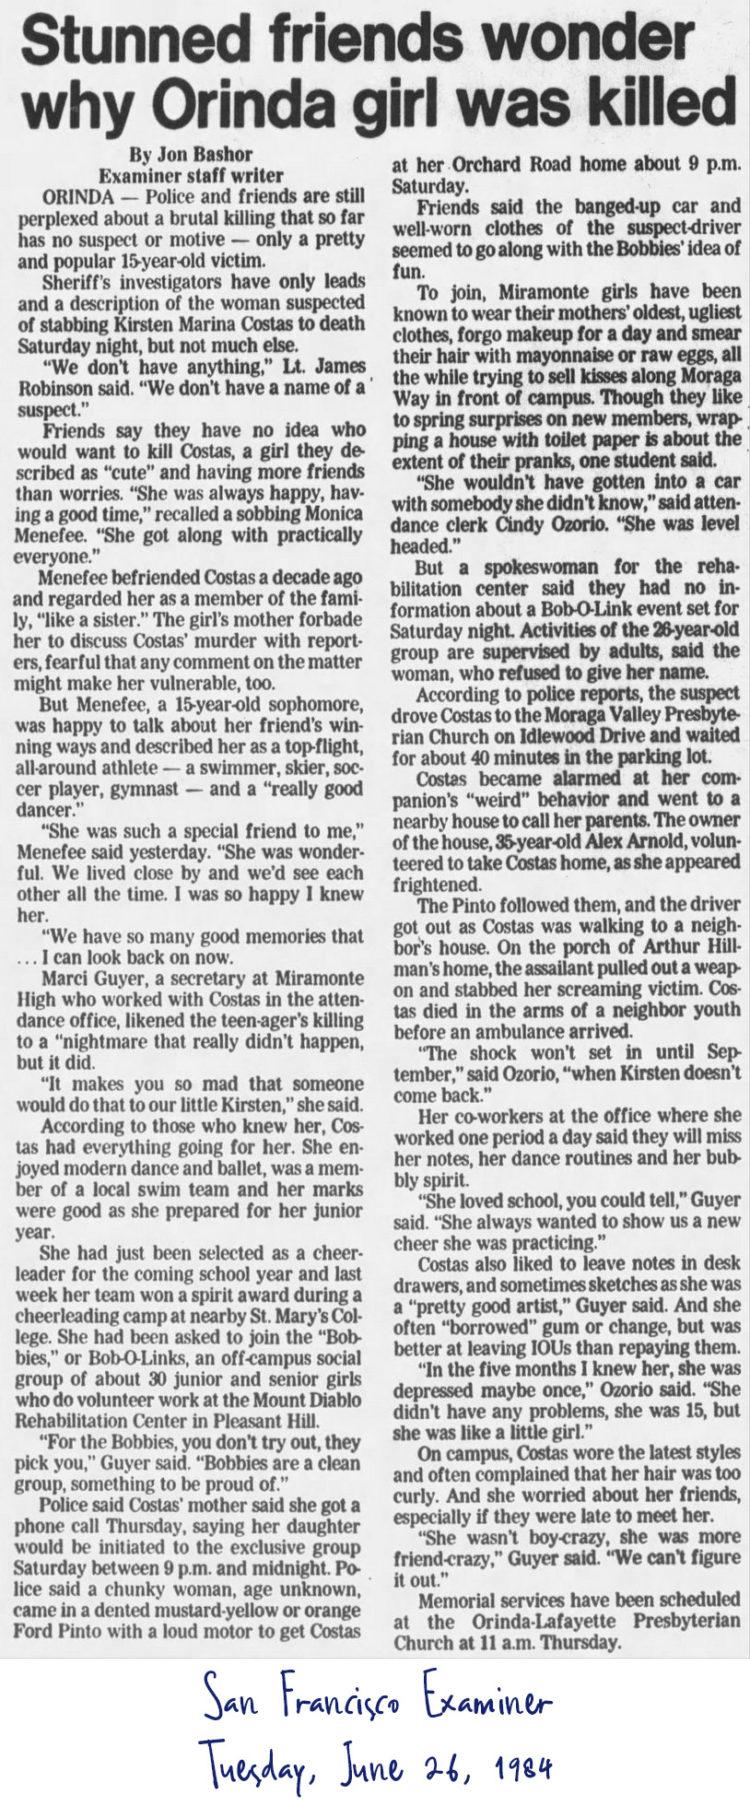 Kirsten Costas murder case newspaper clipping - San Francisco Examiner from June 26 1984